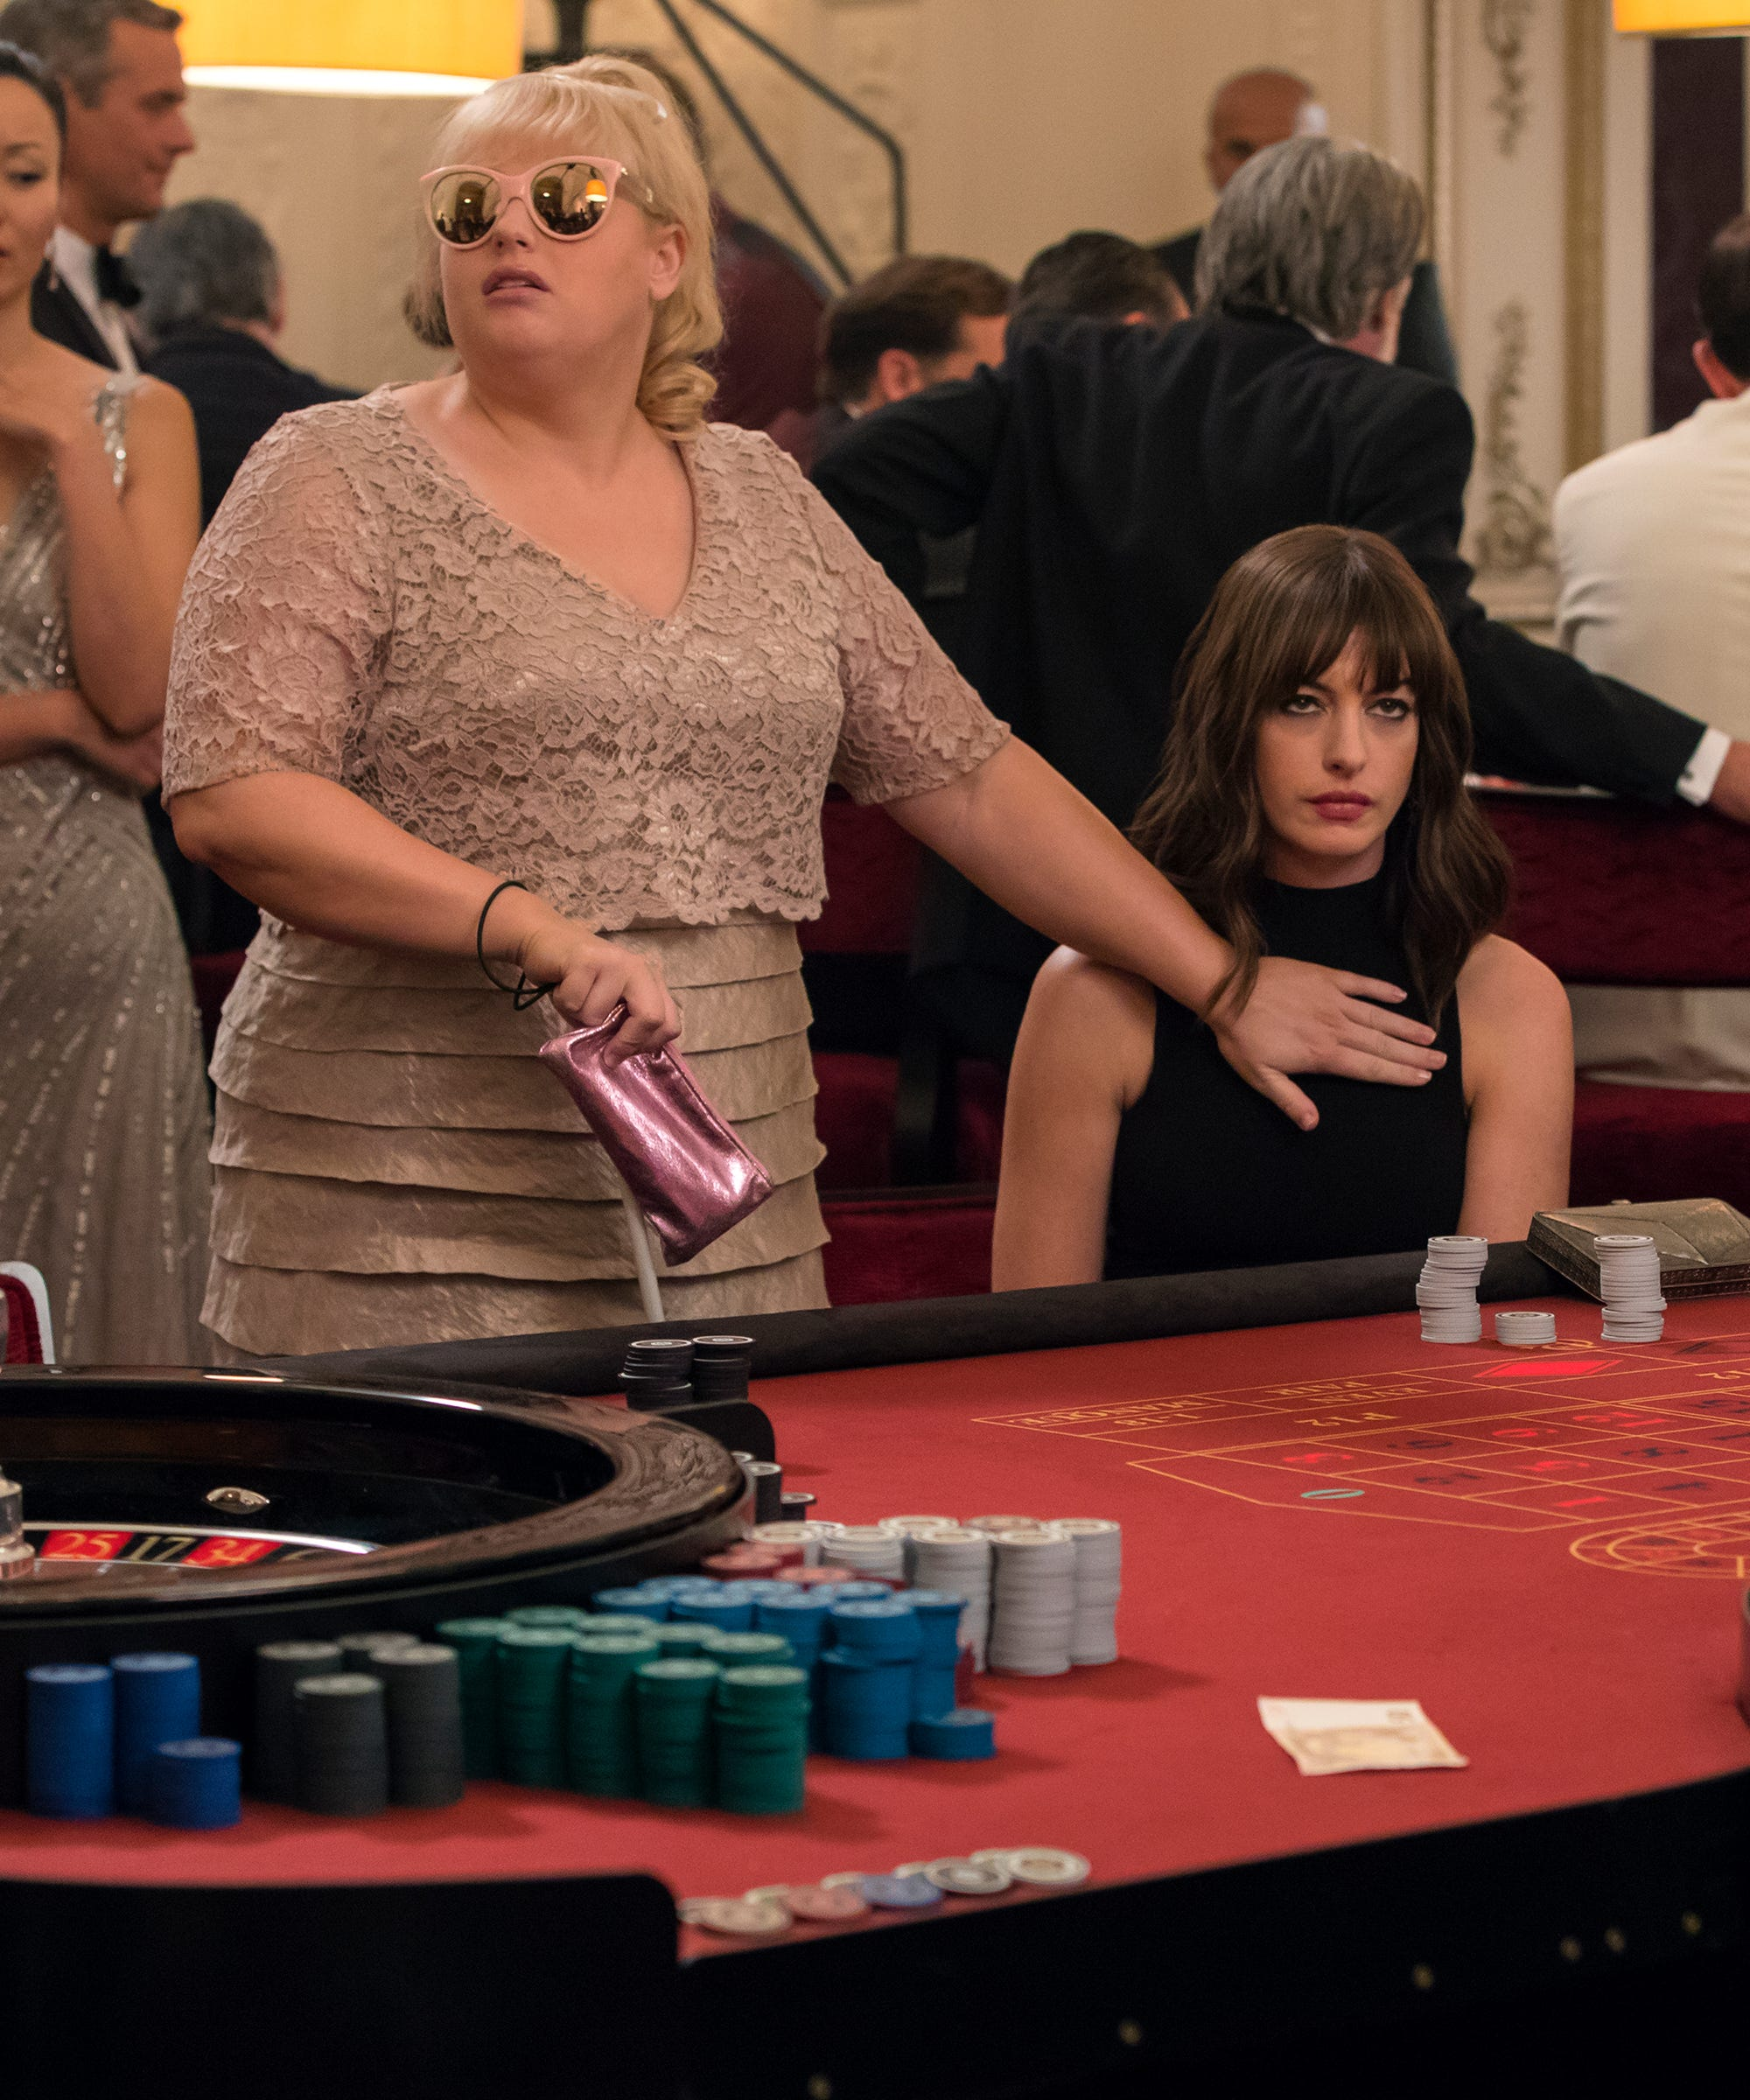 Flipboard: Why Anne Hathaway & Rebel Wilson Had To Fight